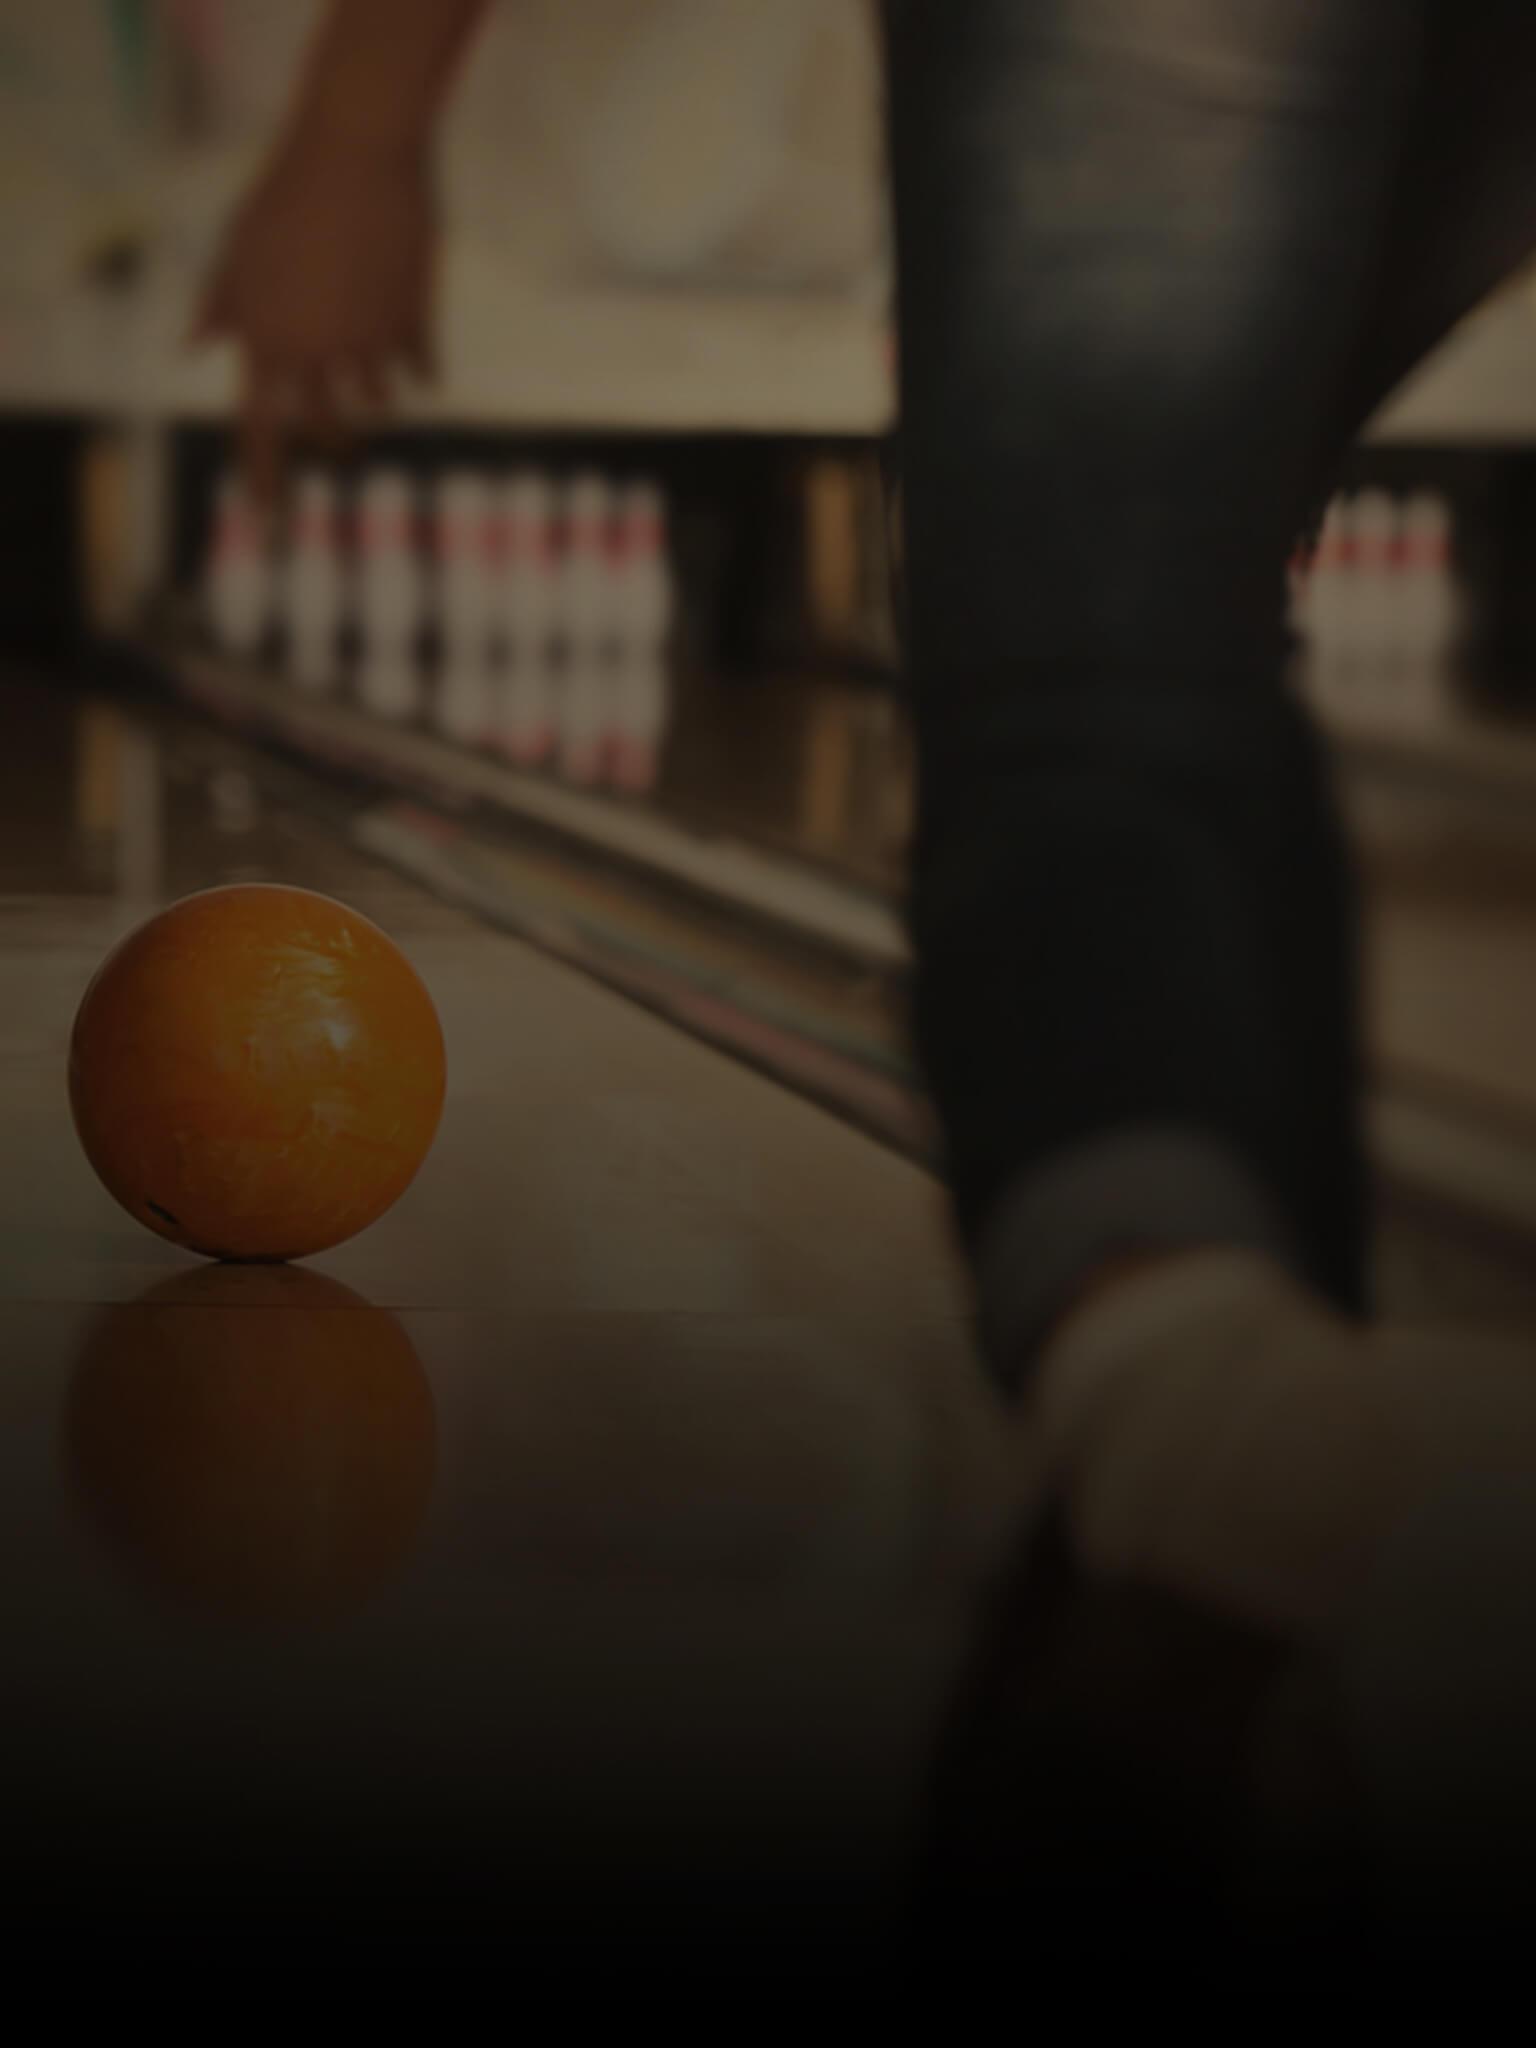 Bowling ipadh